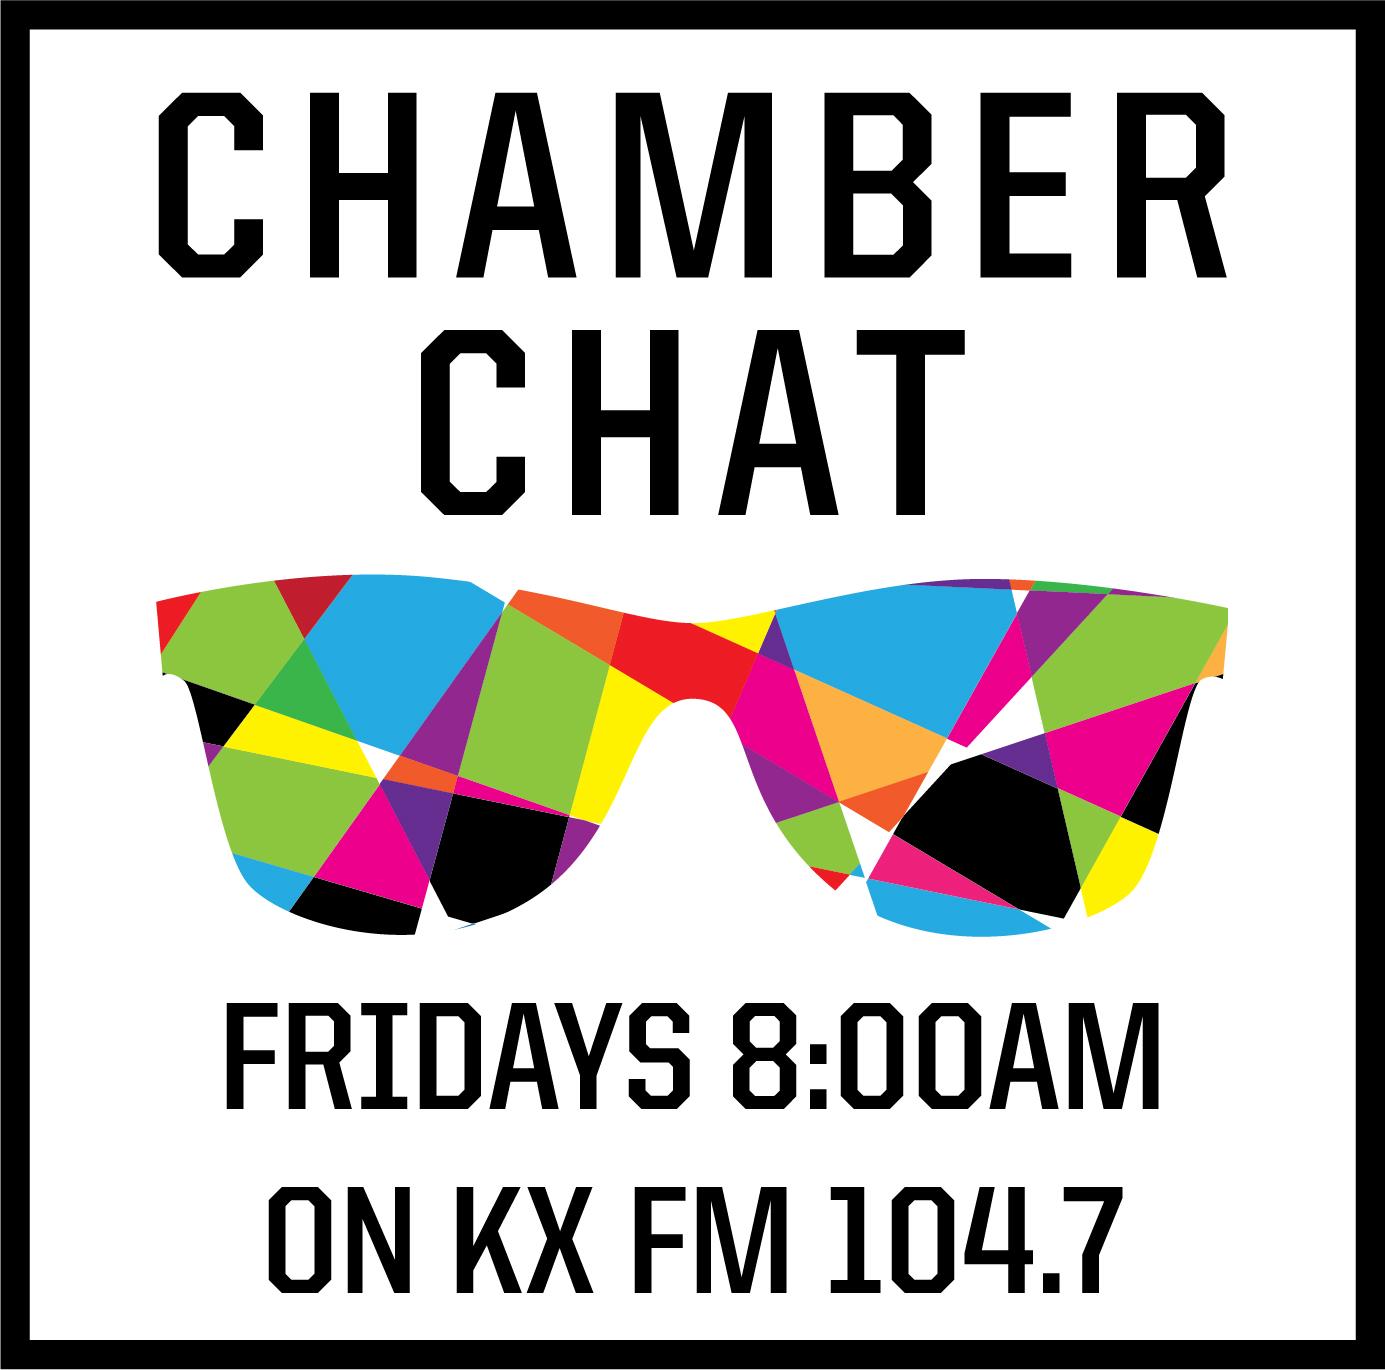 Chamber Chat KX FM